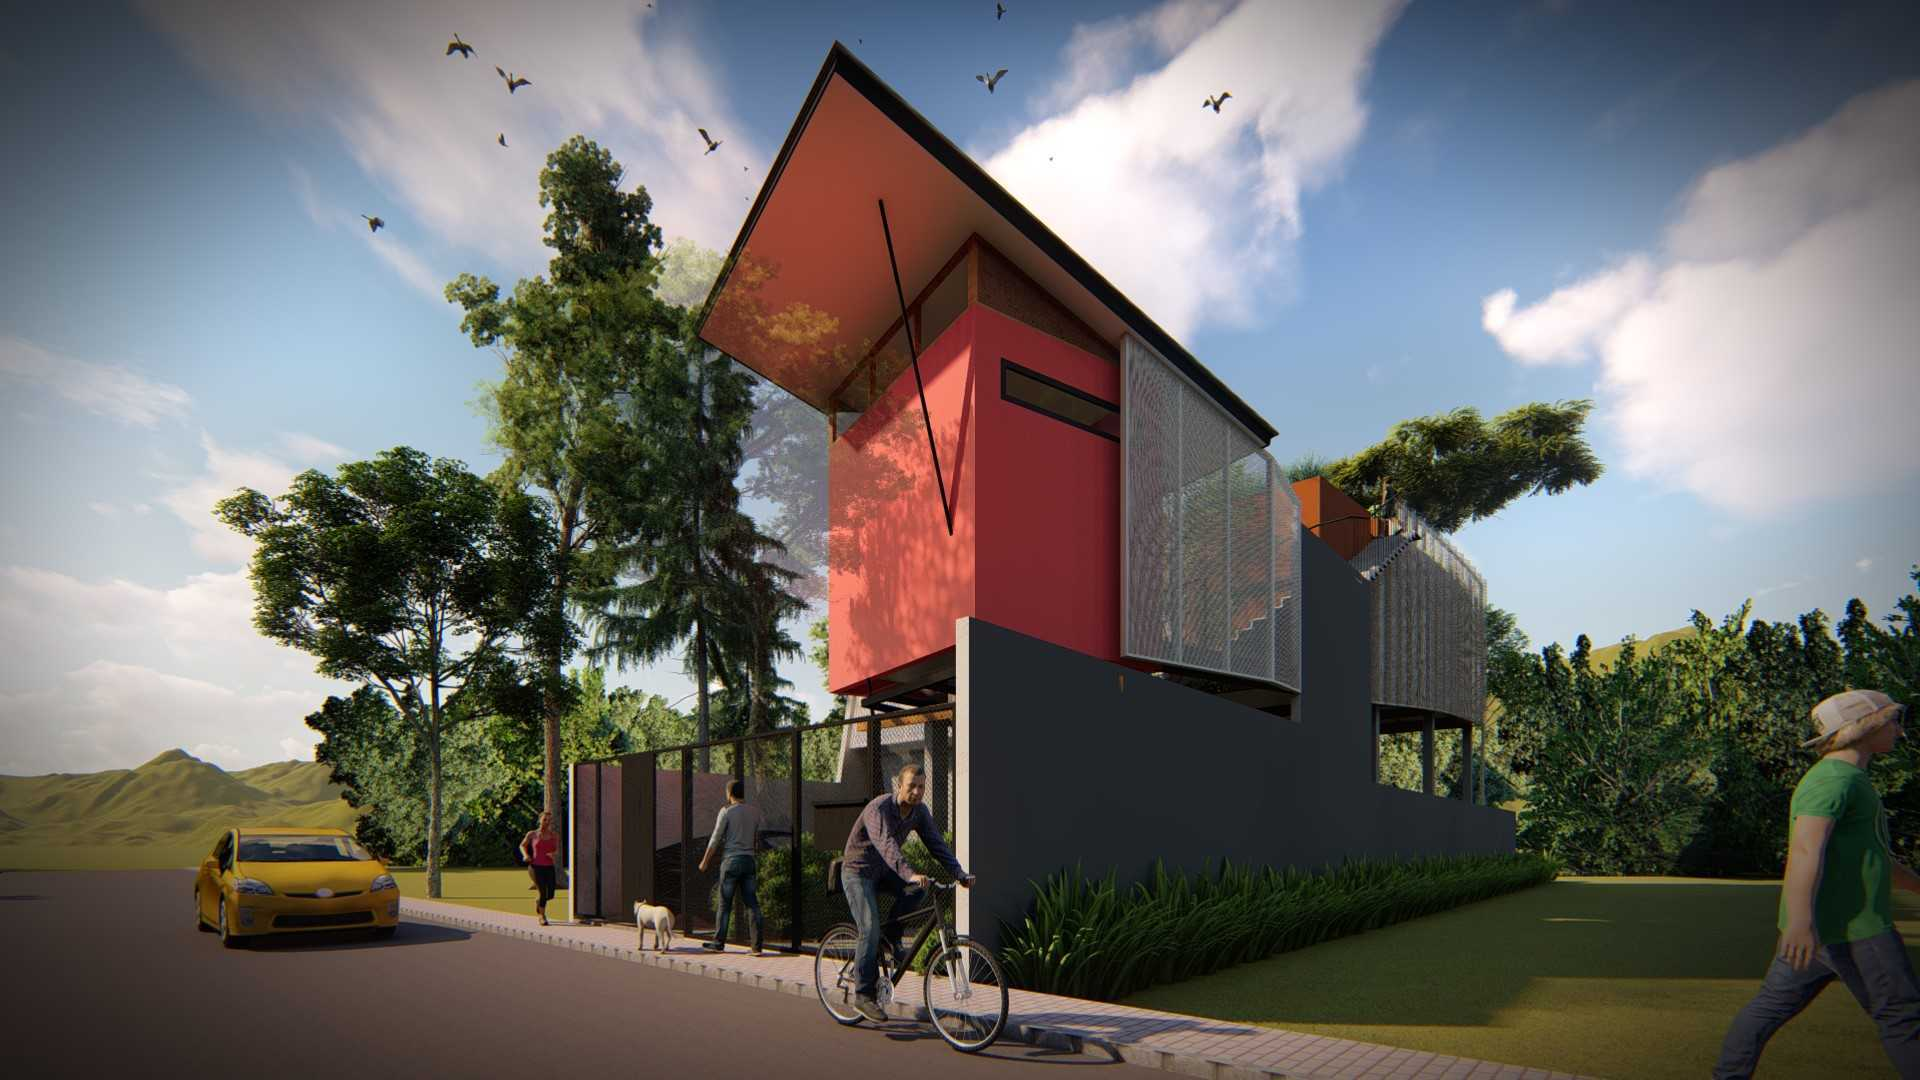 Slight Architect House Sumore Kota Manado, Sulawesi Utara, Indonesia Kota Manado, Sulawesi Utara, Indonesia Slight-Architect-House-Sumore  122813